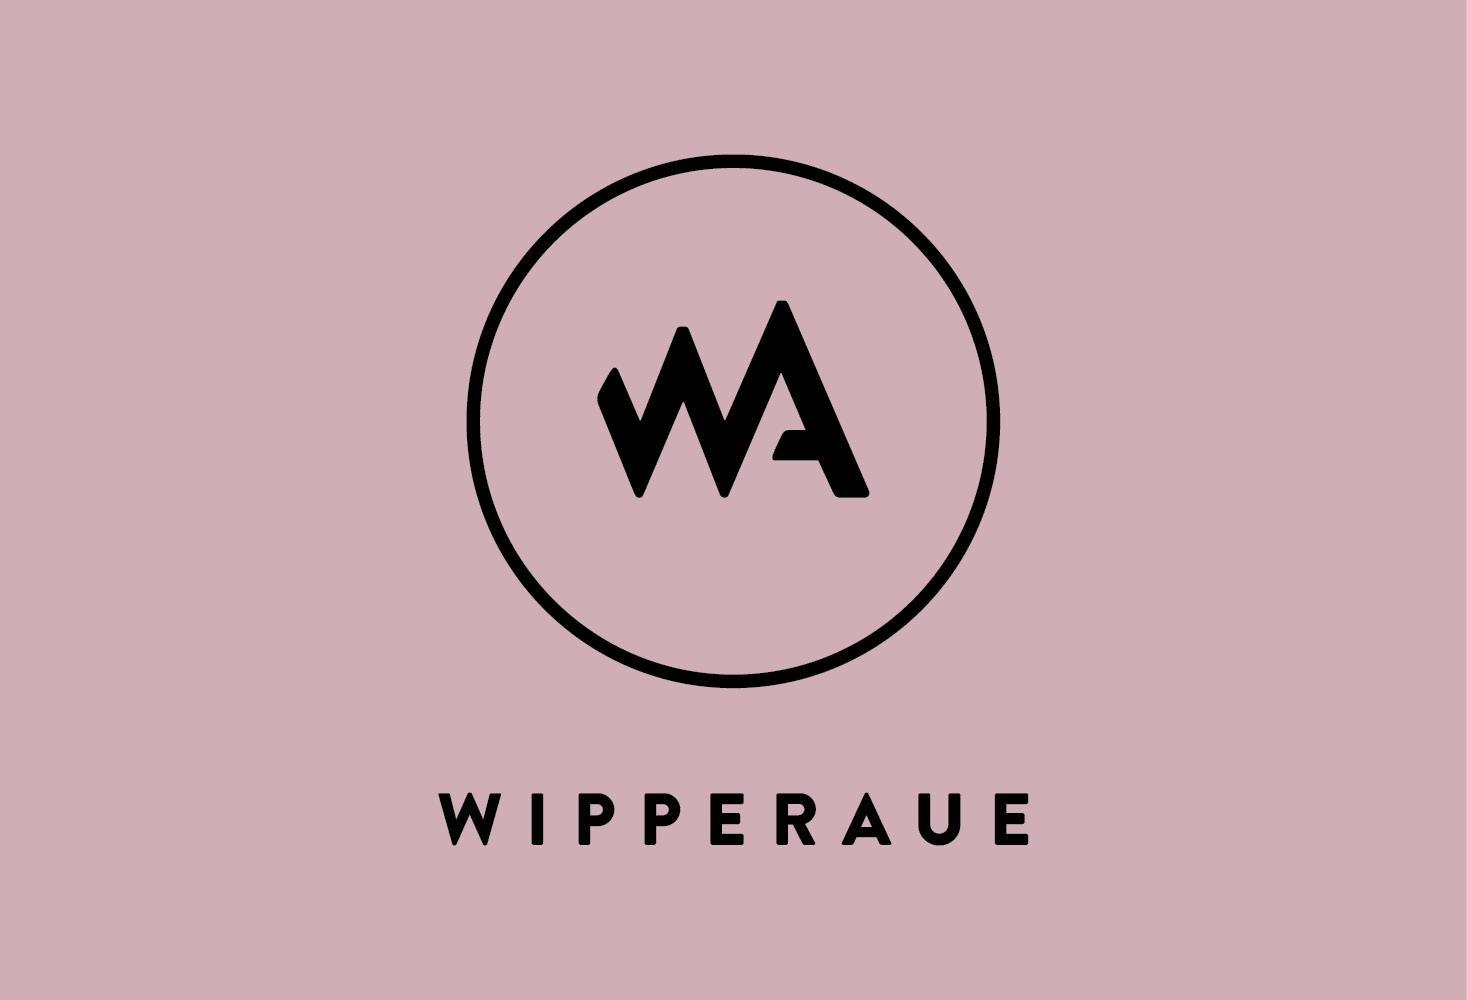 wipperaue_1100x750